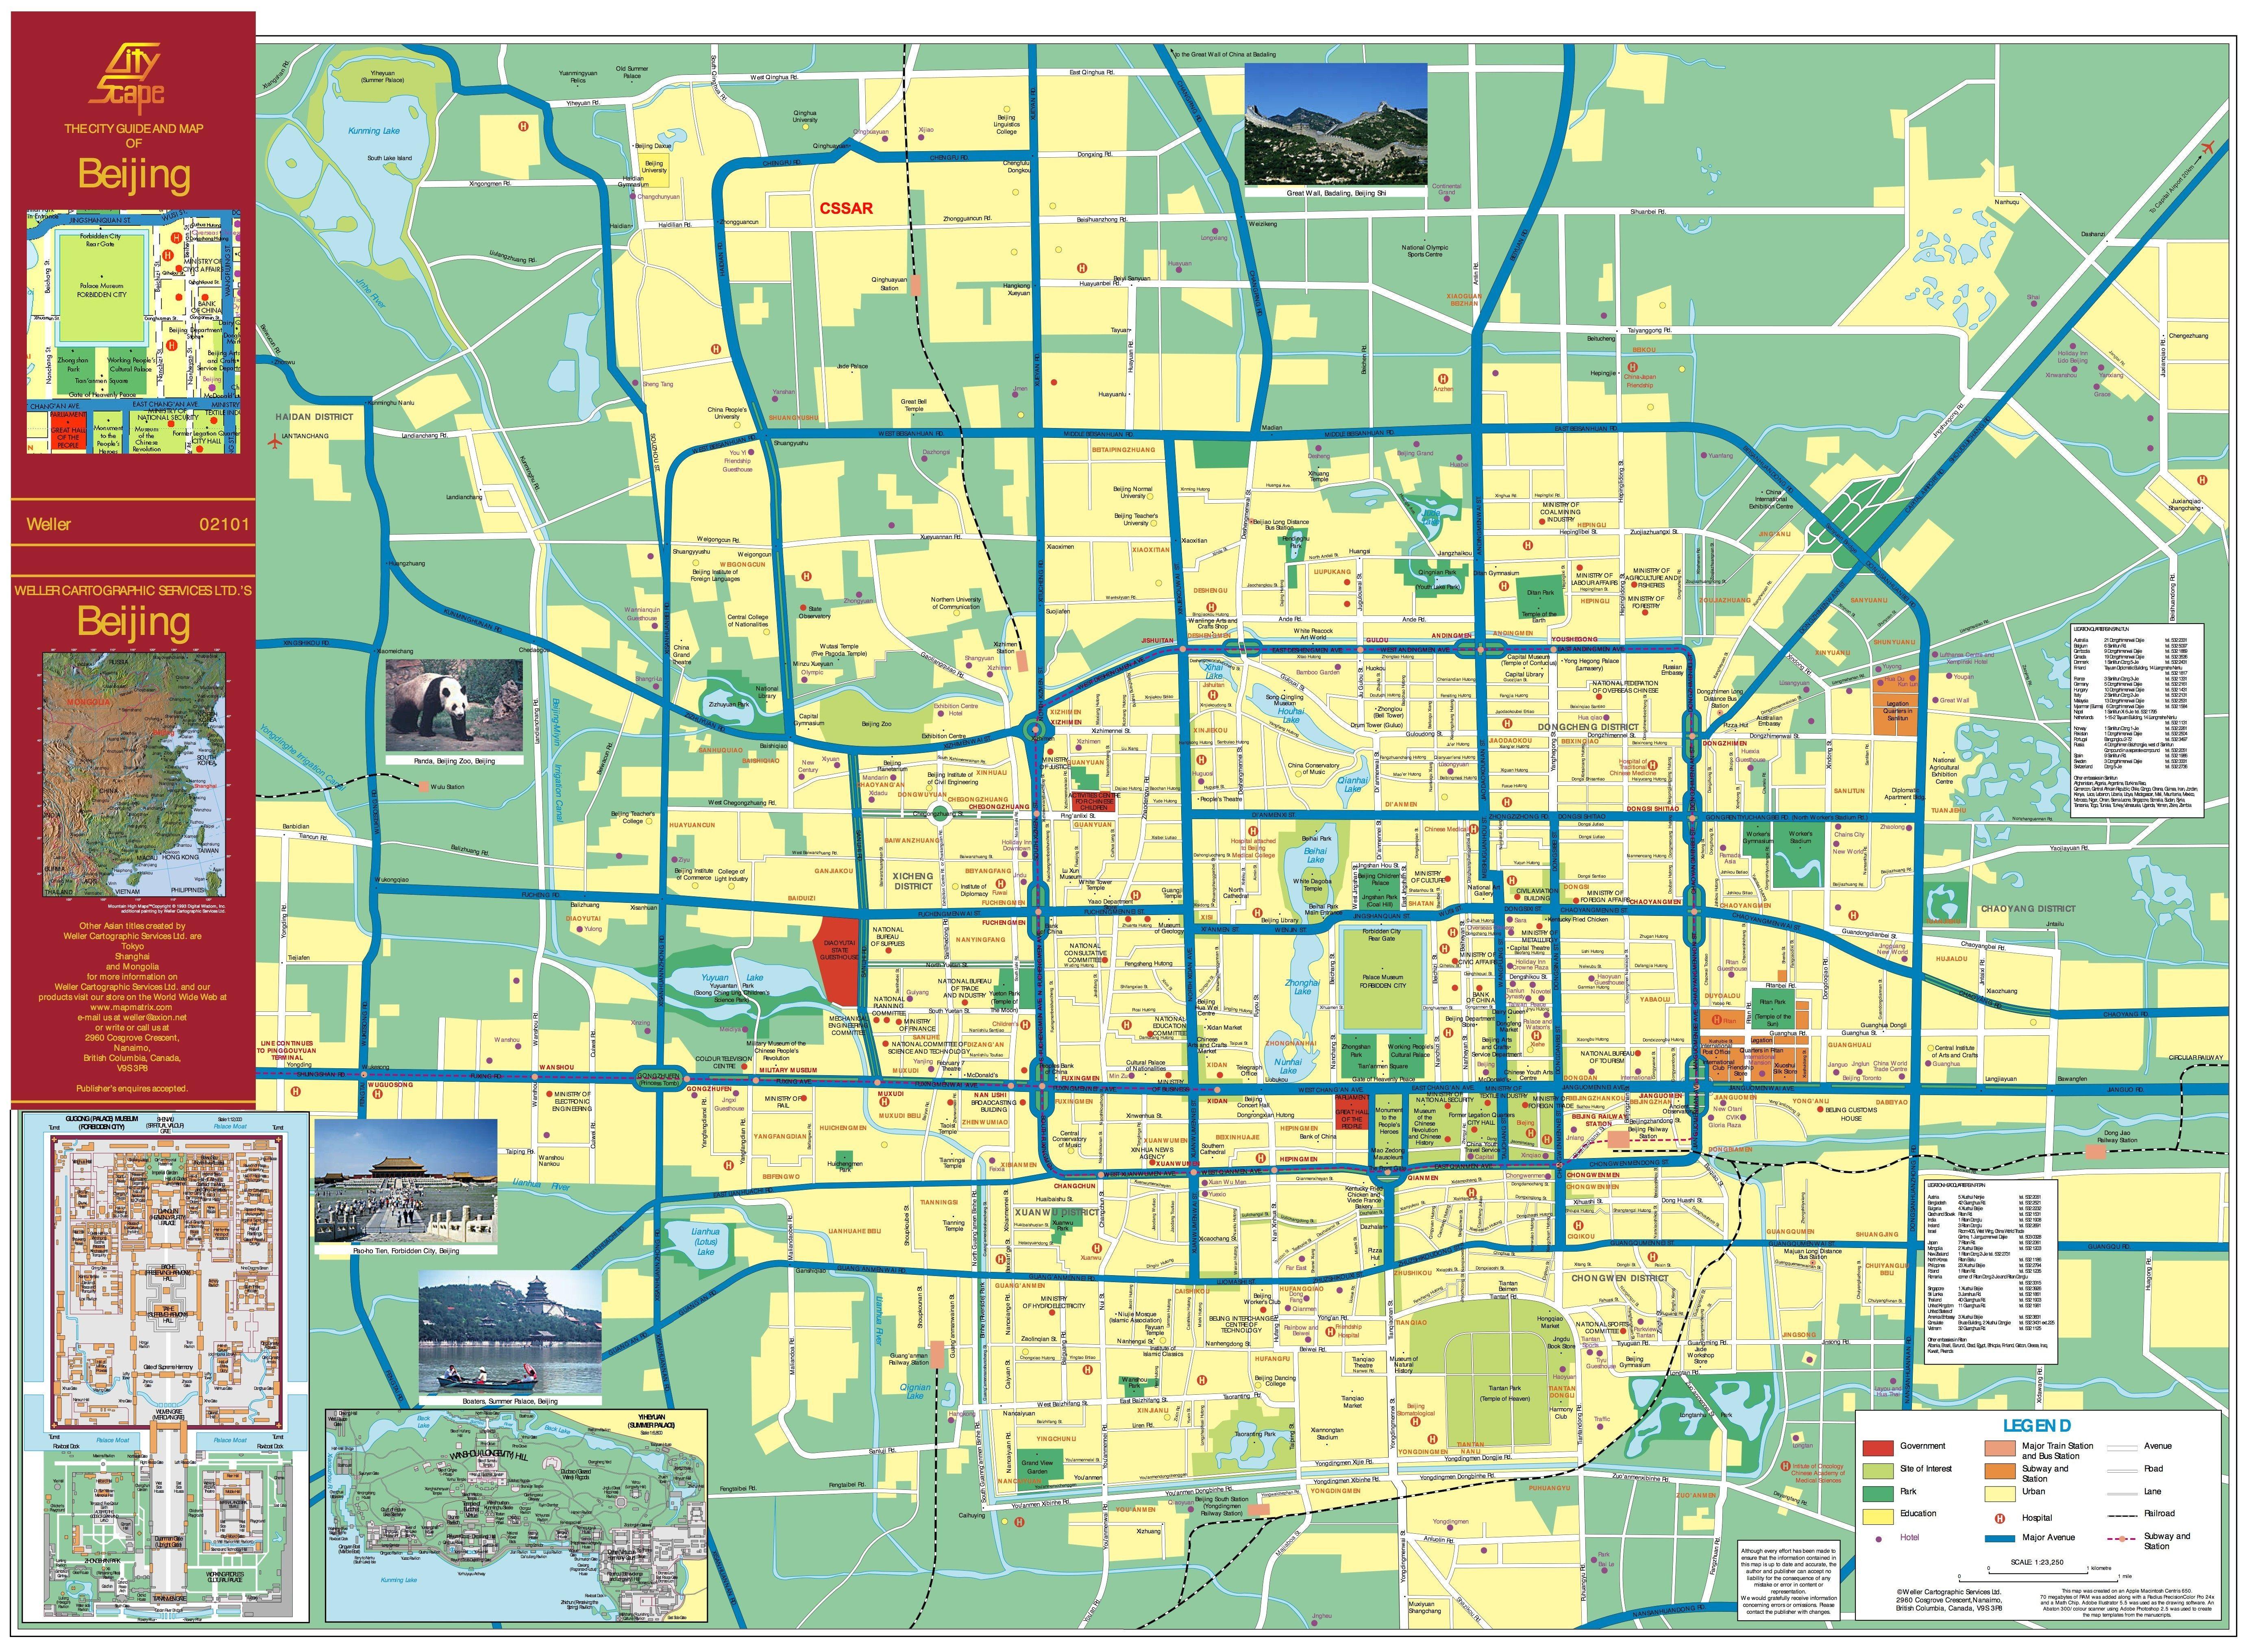 Beijing City Subway Map.Beijing City Map China Map China Map Subway Map City Maps